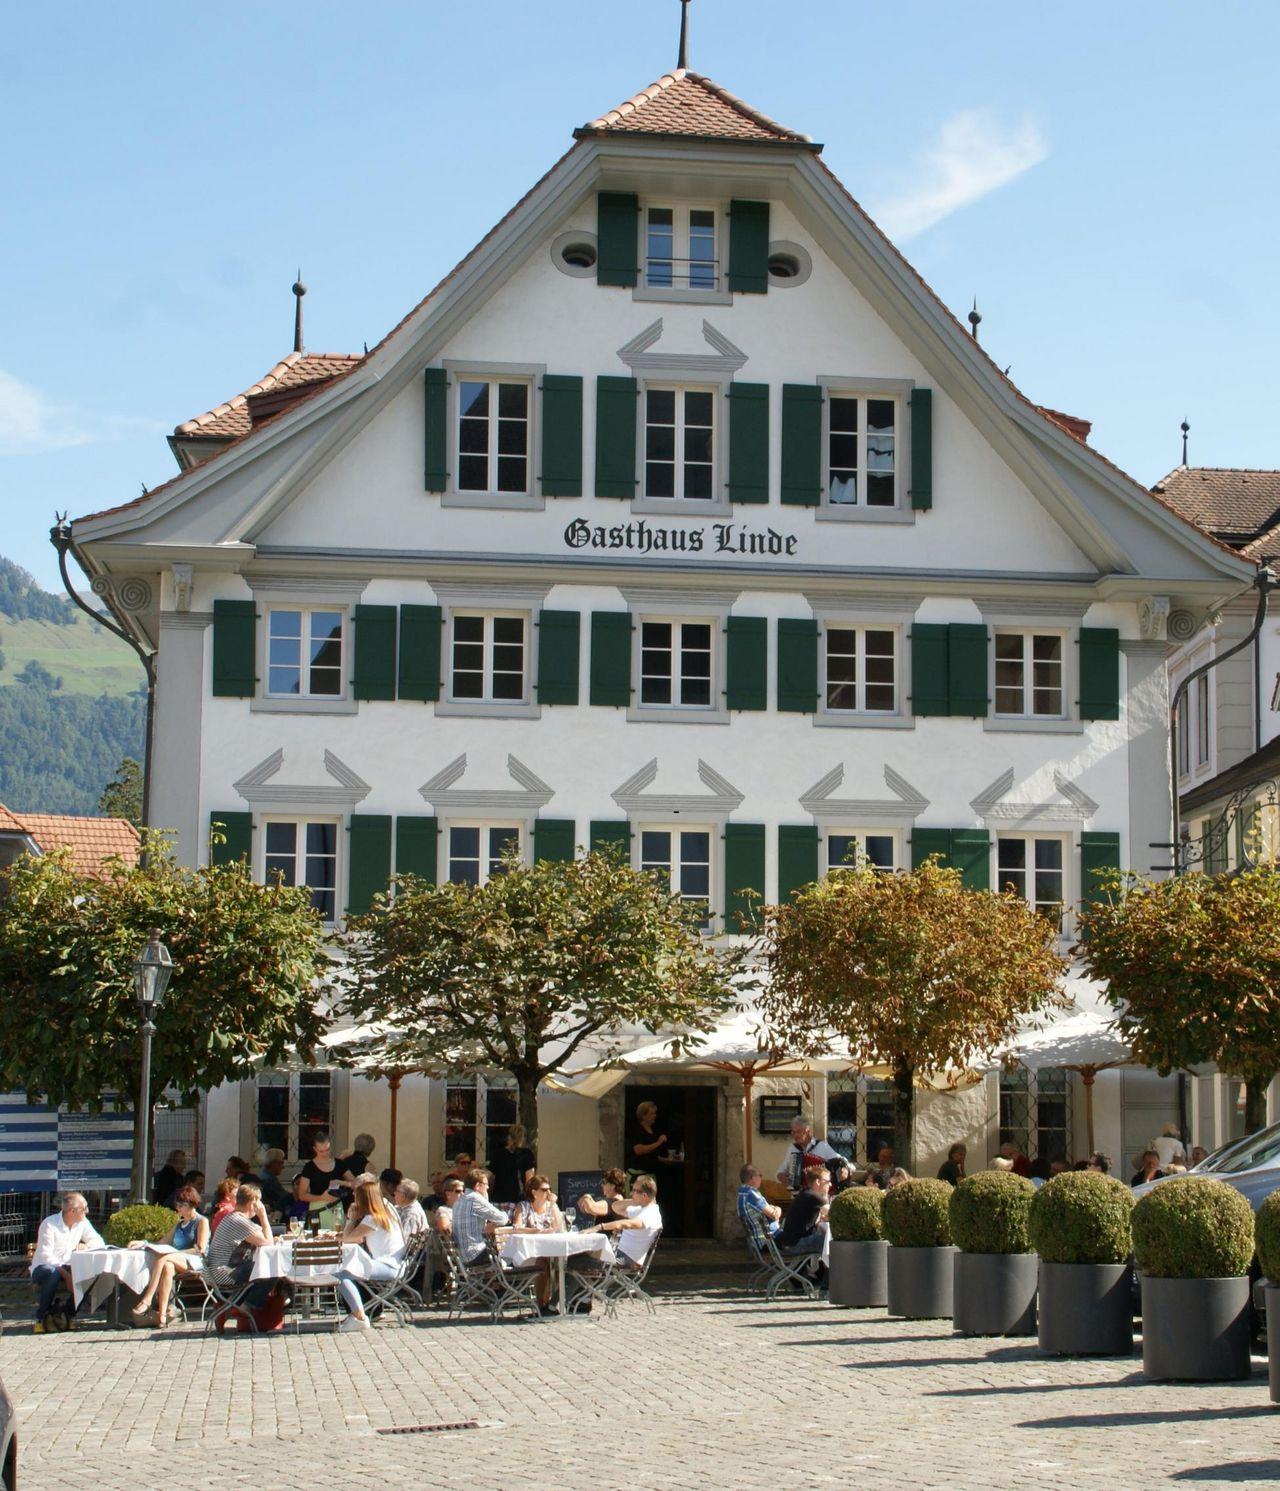 Restaurant Linde, Stans